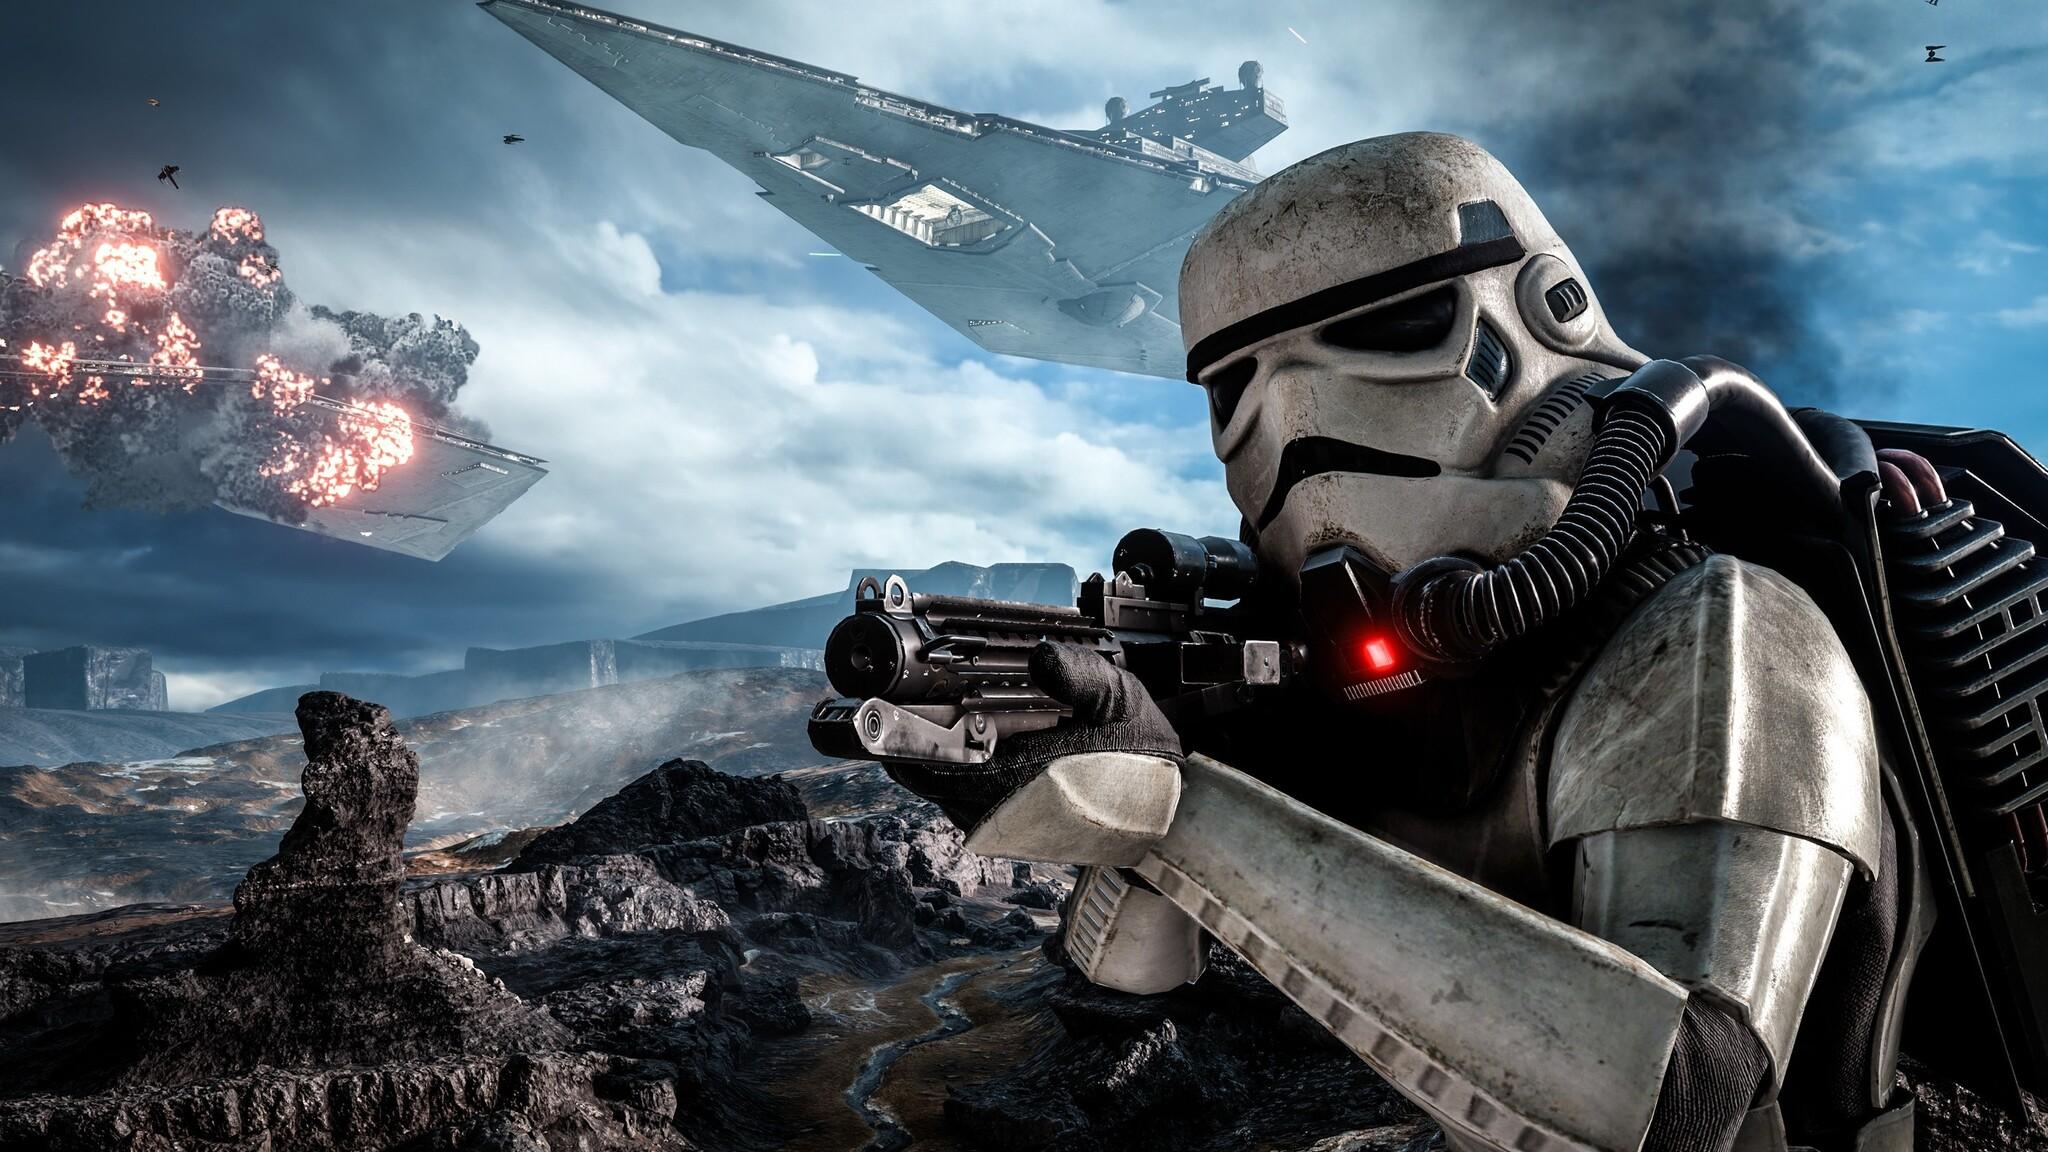 2048x1152 stormtroopers star wars battlefront 2048x1152